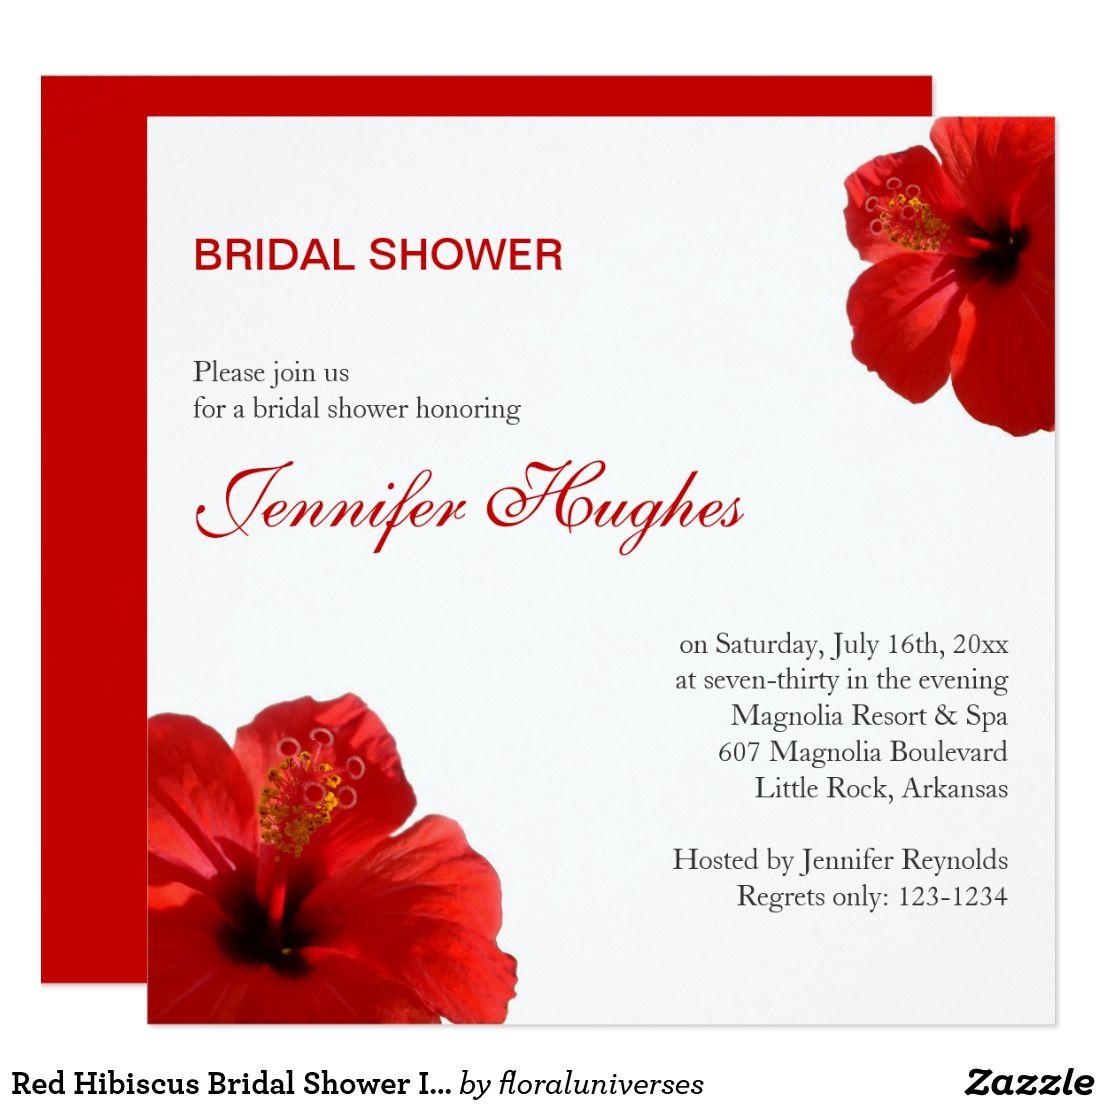 Red Hibiscus Bridal Shower Invitation | Summer Weddings | Pinterest ...